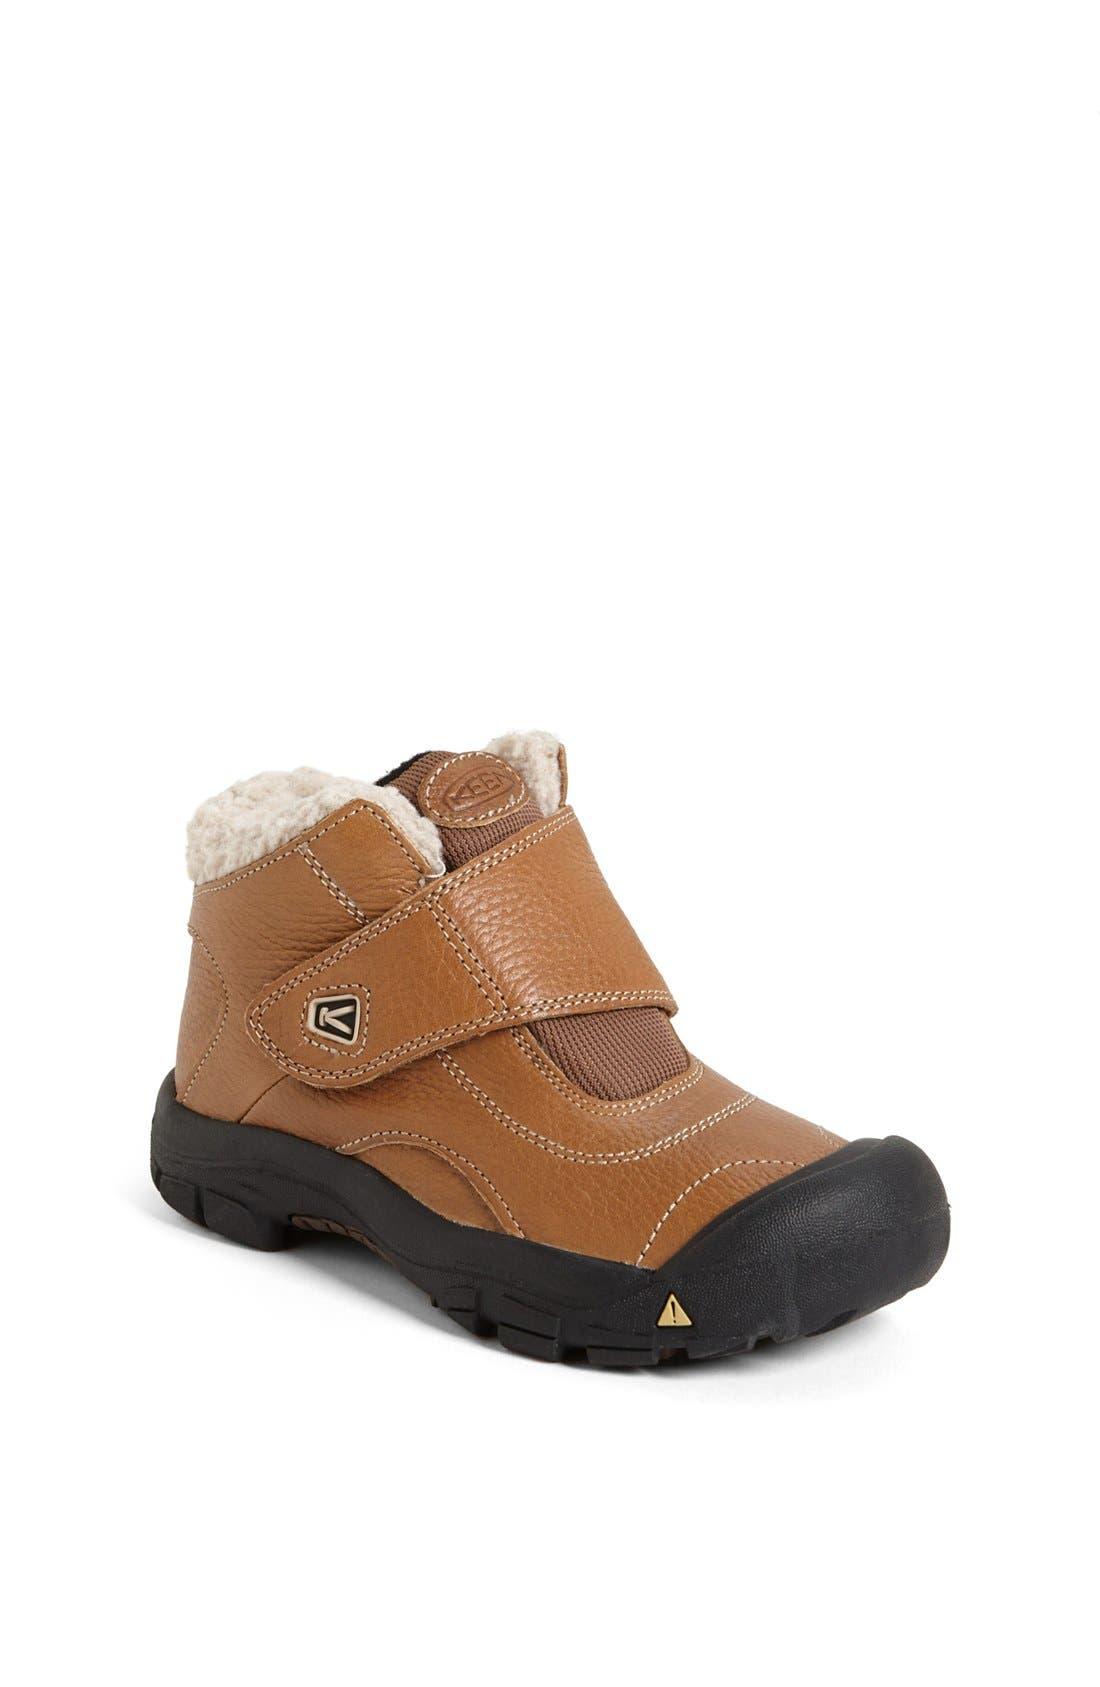 Alternate Image 1 Selected - Keen 'Kootenay' Boot (Baby, Walker, Toddler & Little Kid)